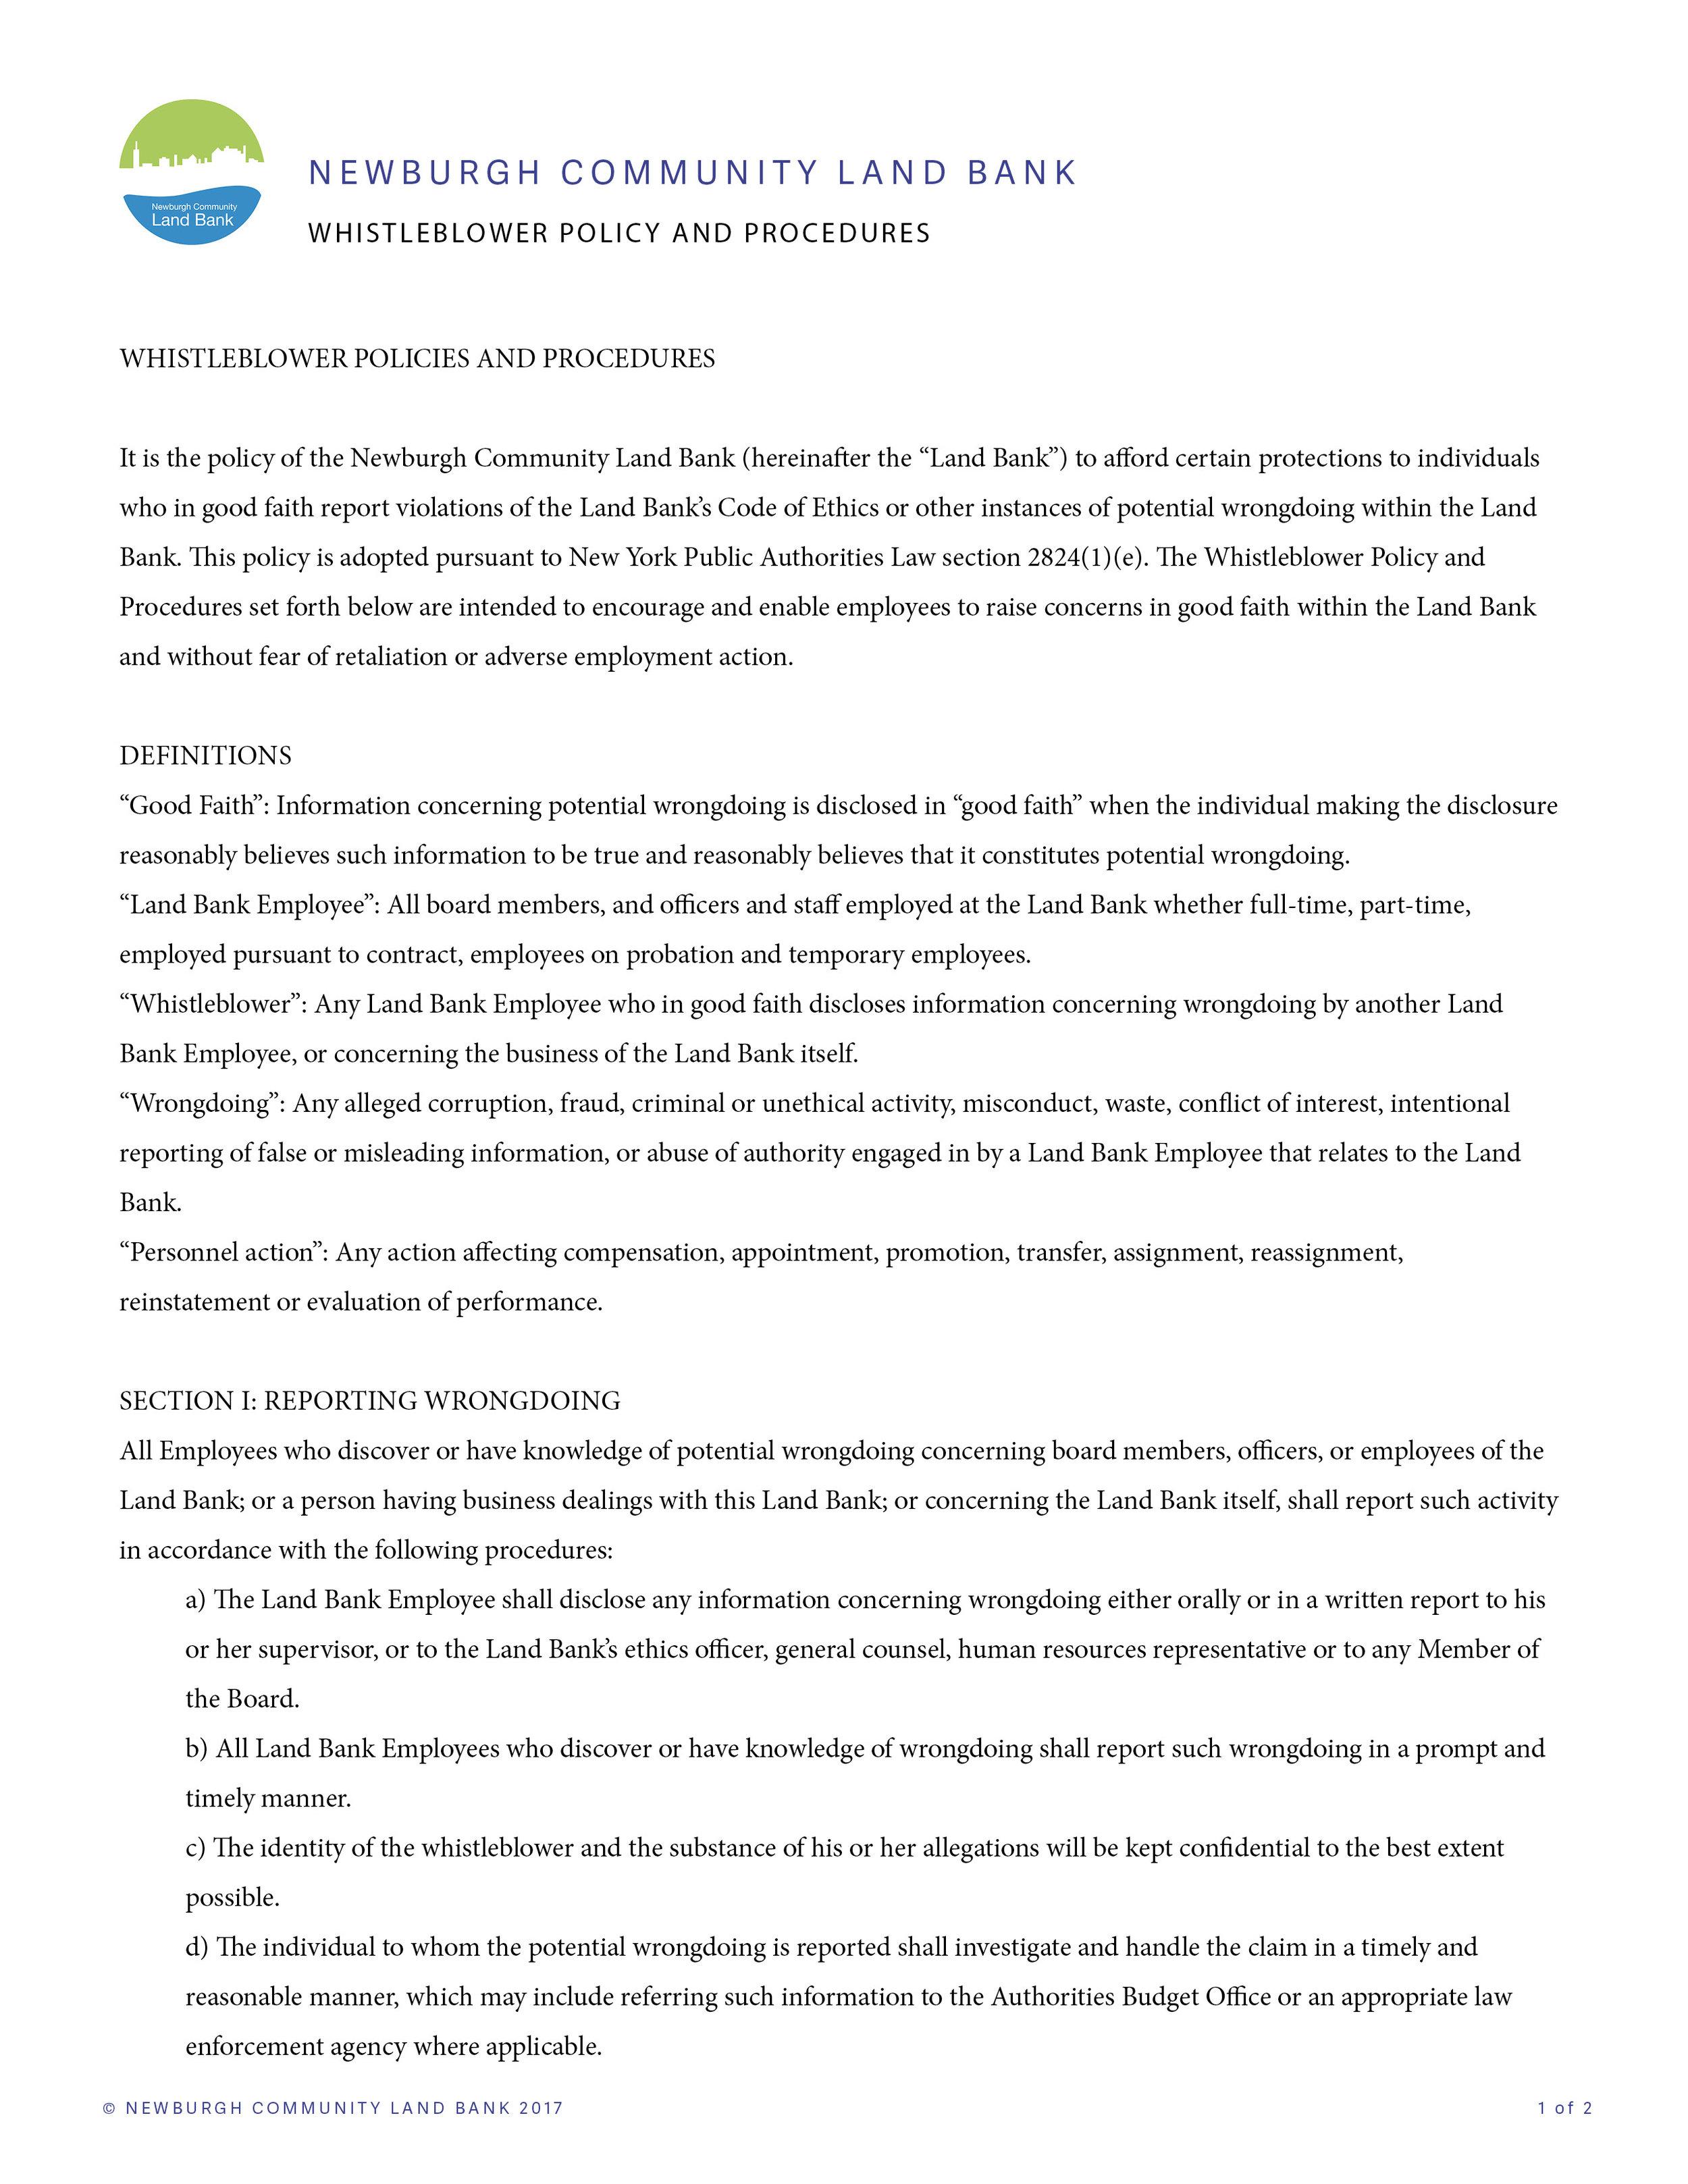 NCLB Whistleblower Policy1.jpg